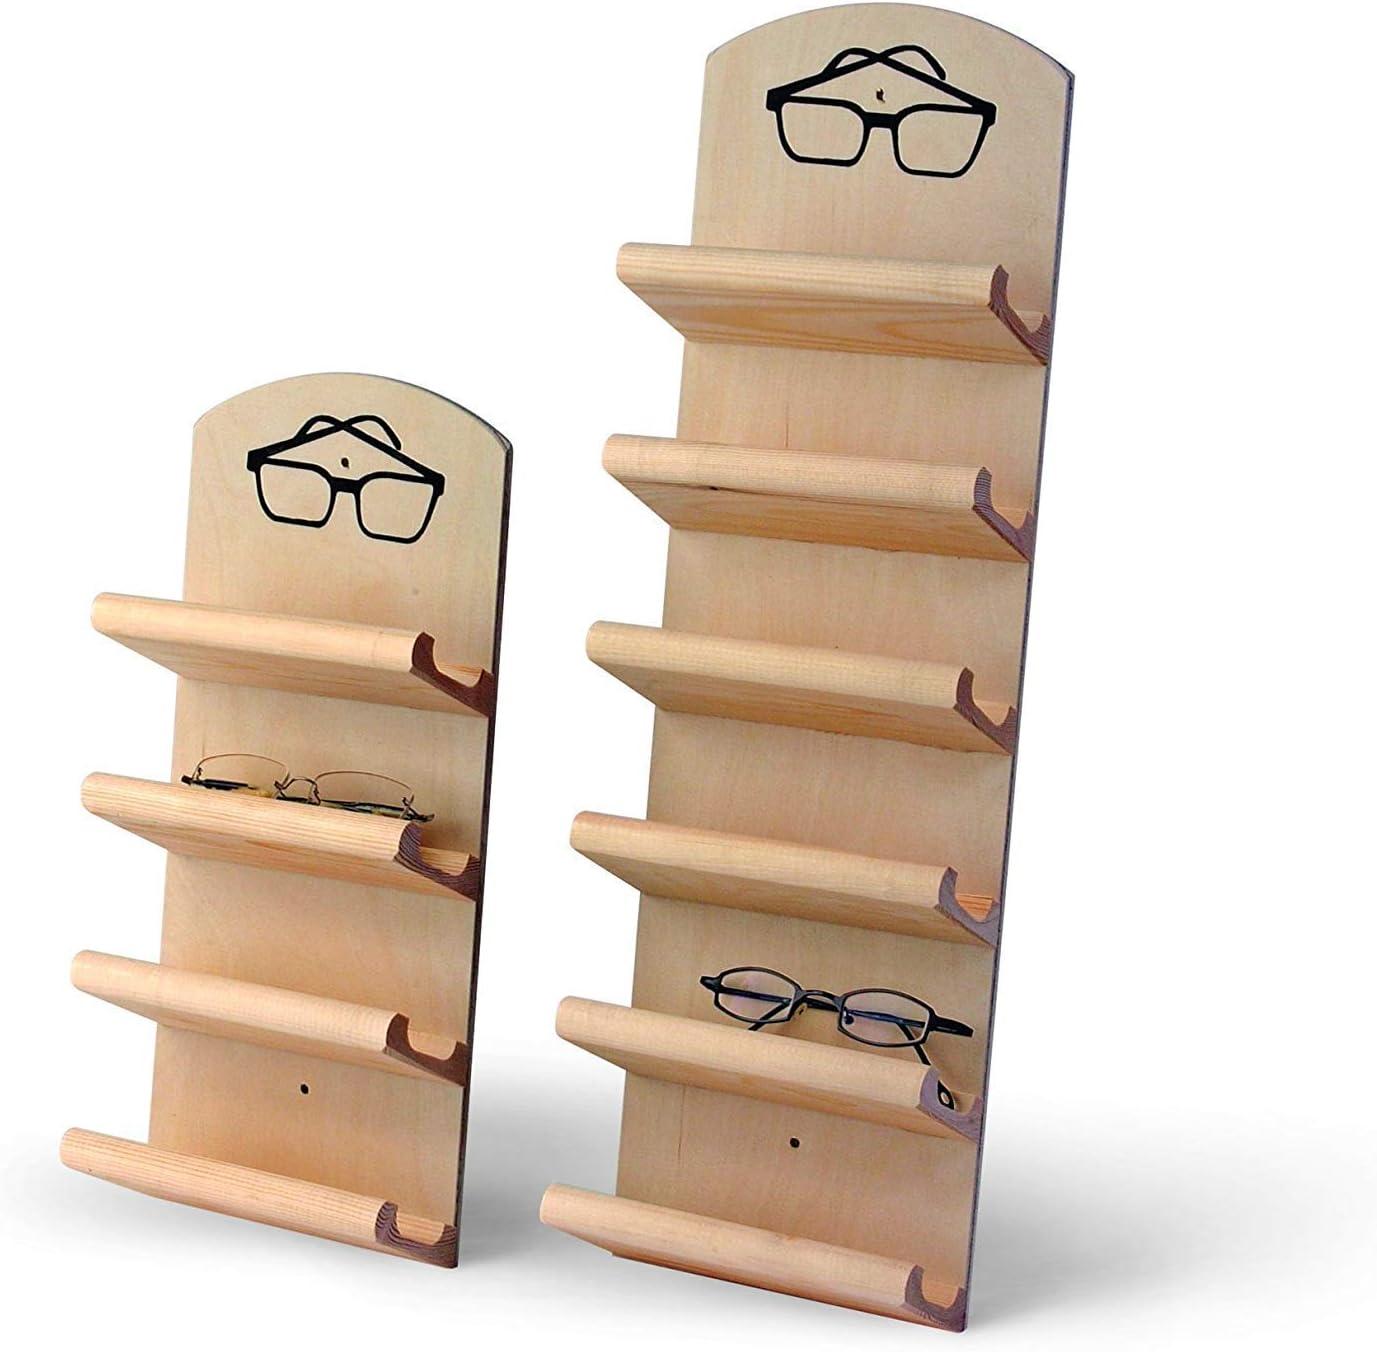 Sauna Classic Eyeglass holder fa/ƒa/¼r 6 Glasses Glasses rack 6-car glasses rack by Finnsa